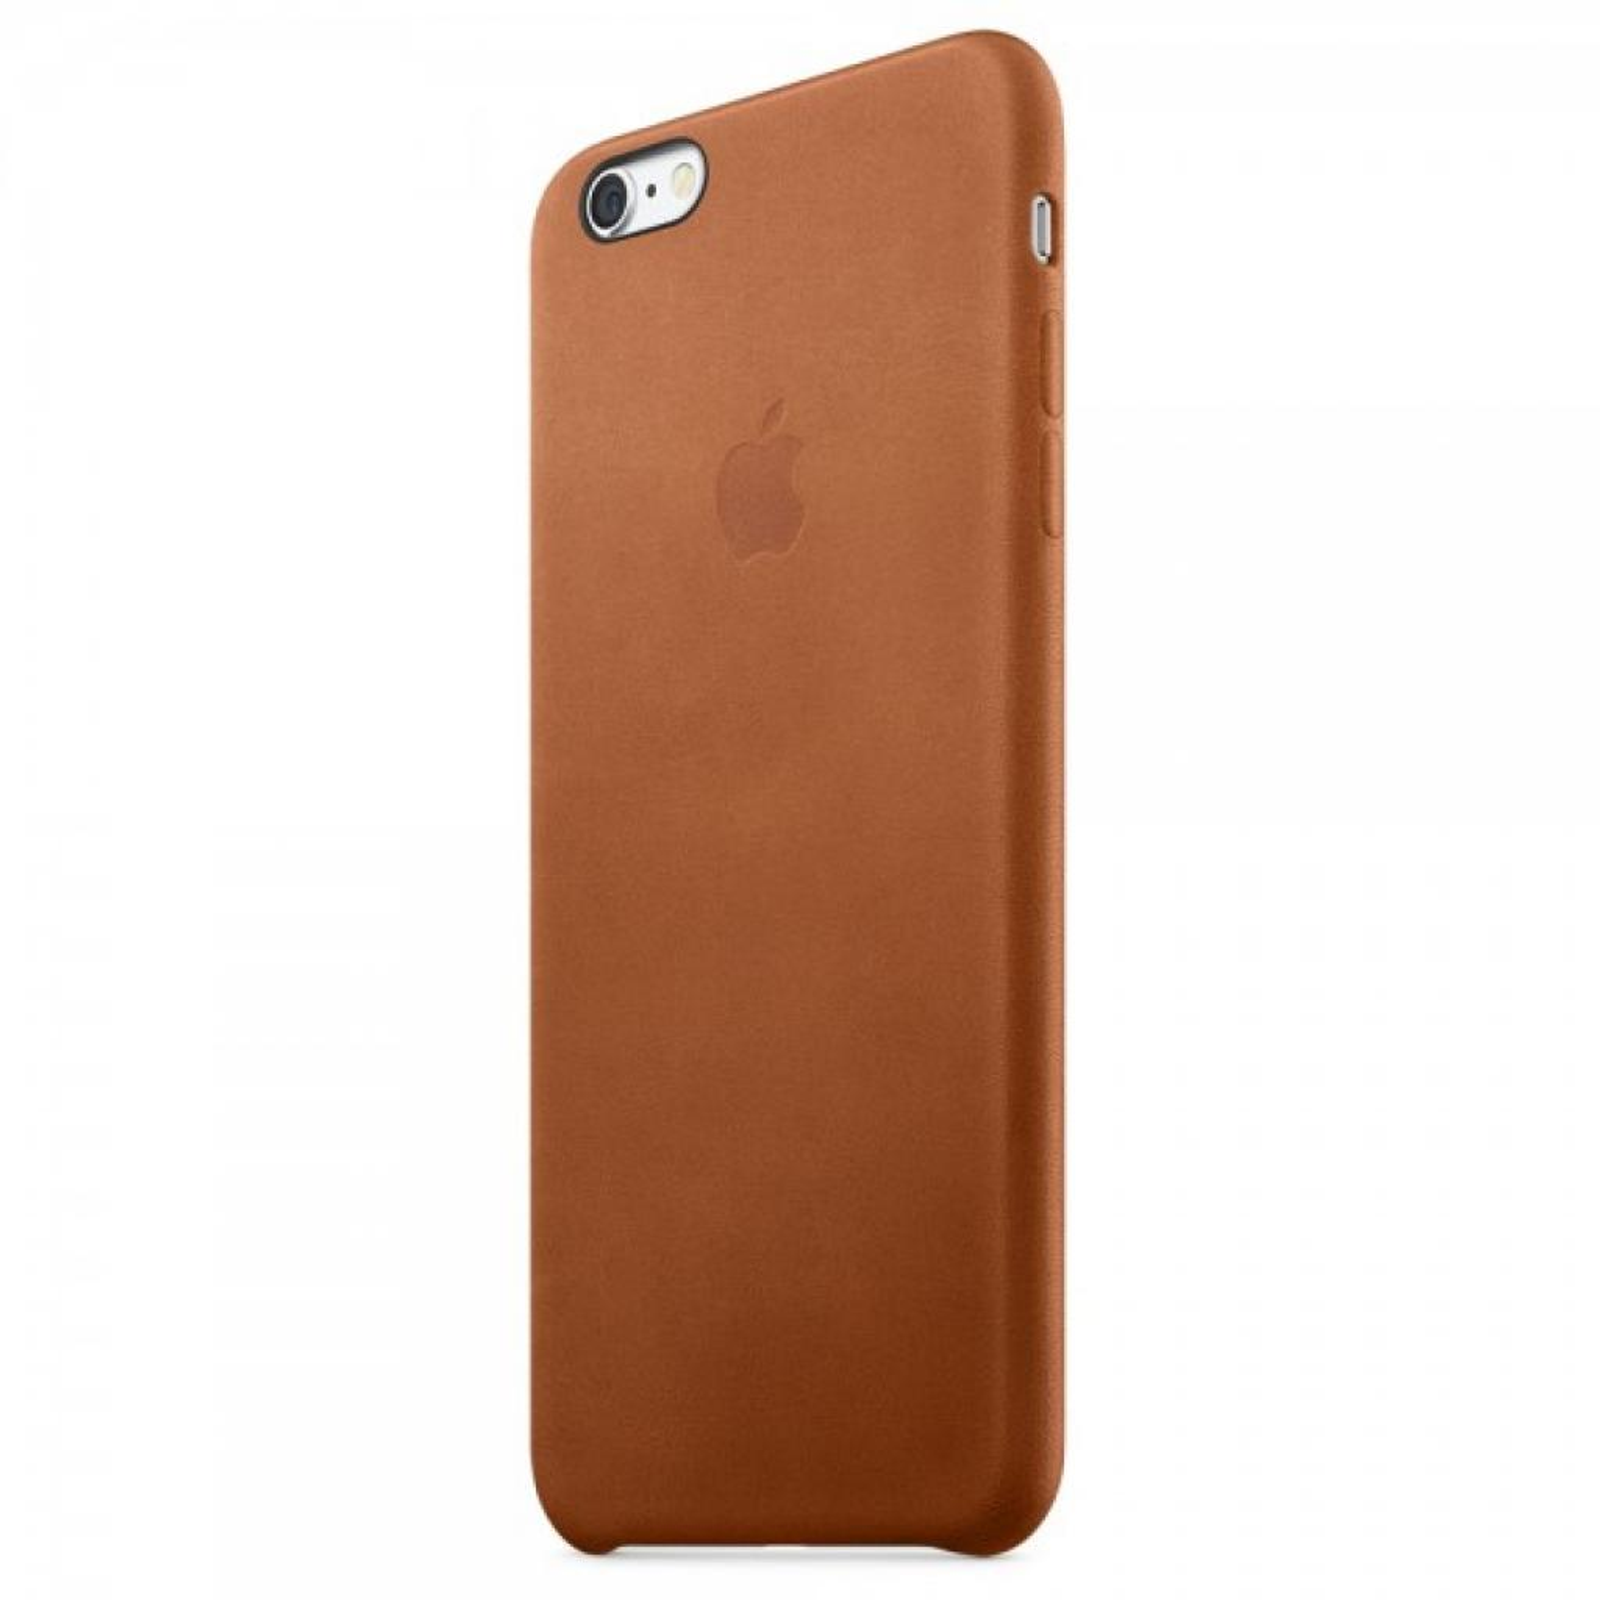 Чехол для моб. телефона Apple для iPhone 6 Plus/6s Plus Saddle Brown (MKXC2ZM/A) изображение 2